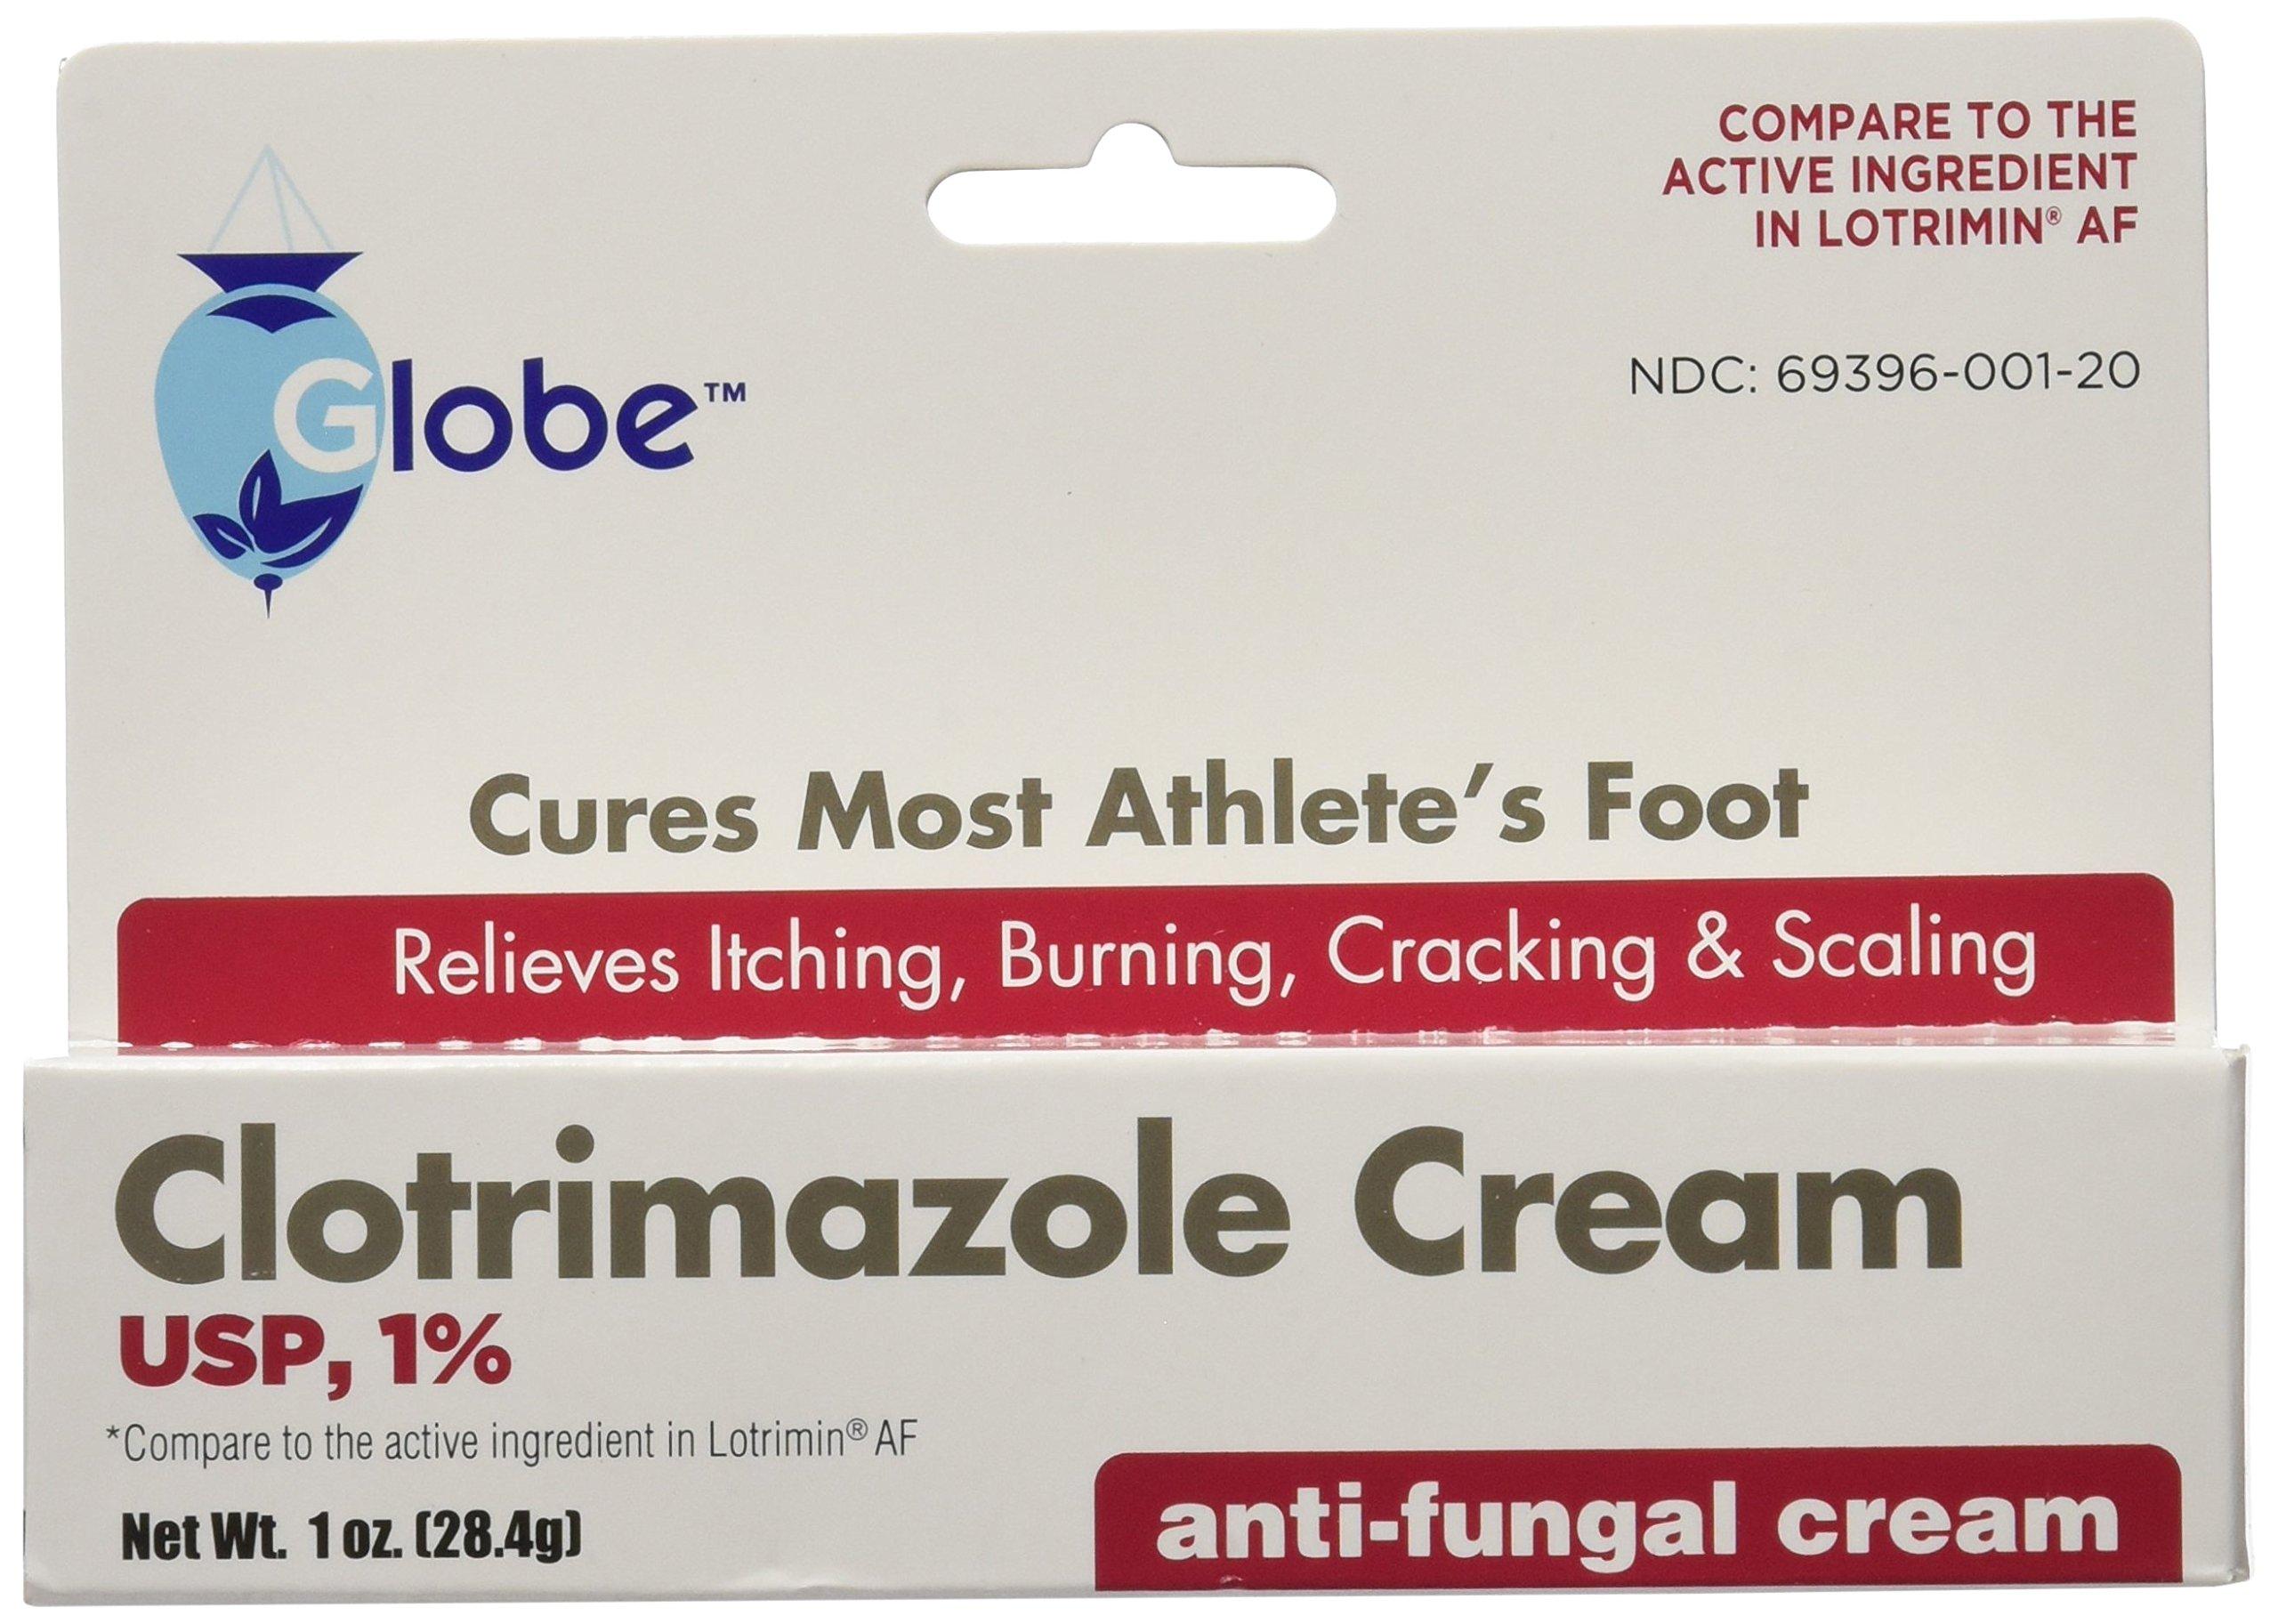 (5 pack) Clotrimazole Antifungal Cream 1% USP 1.0 oz Compare to Lotrimin Active Ingredient